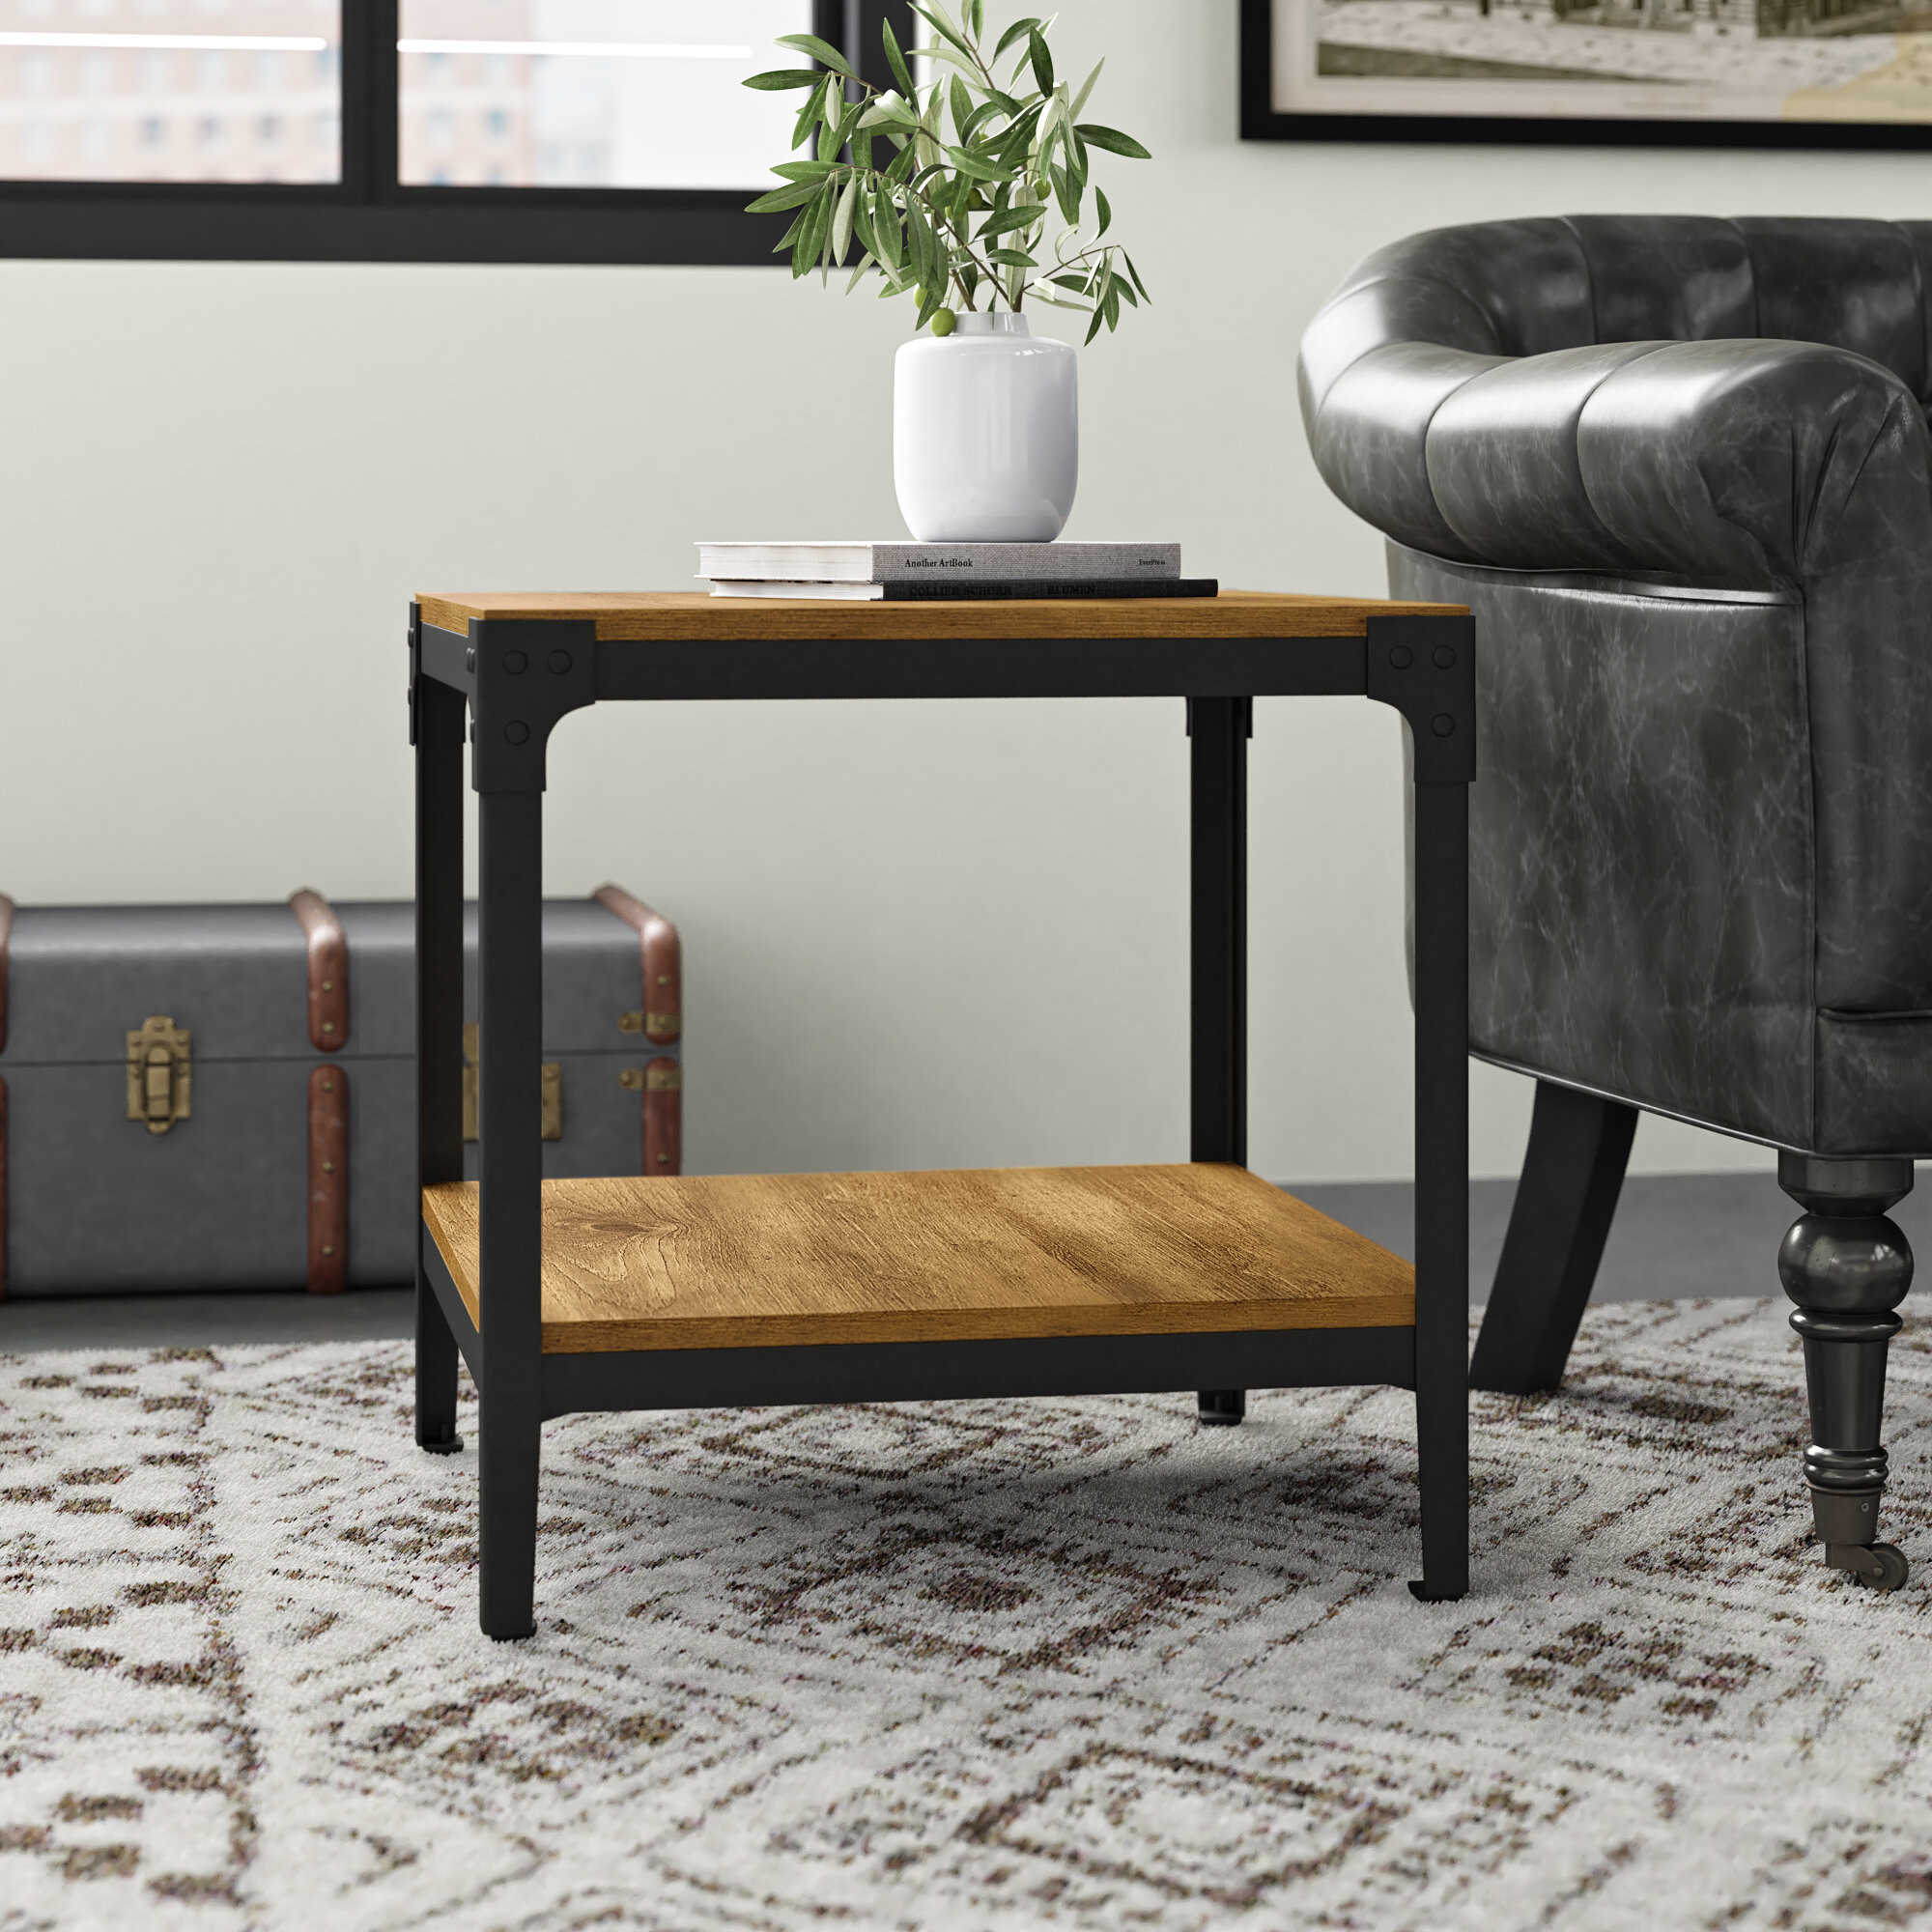 Greyleigh Cainsville 4 Legs End Table Set Reviews Wayfair